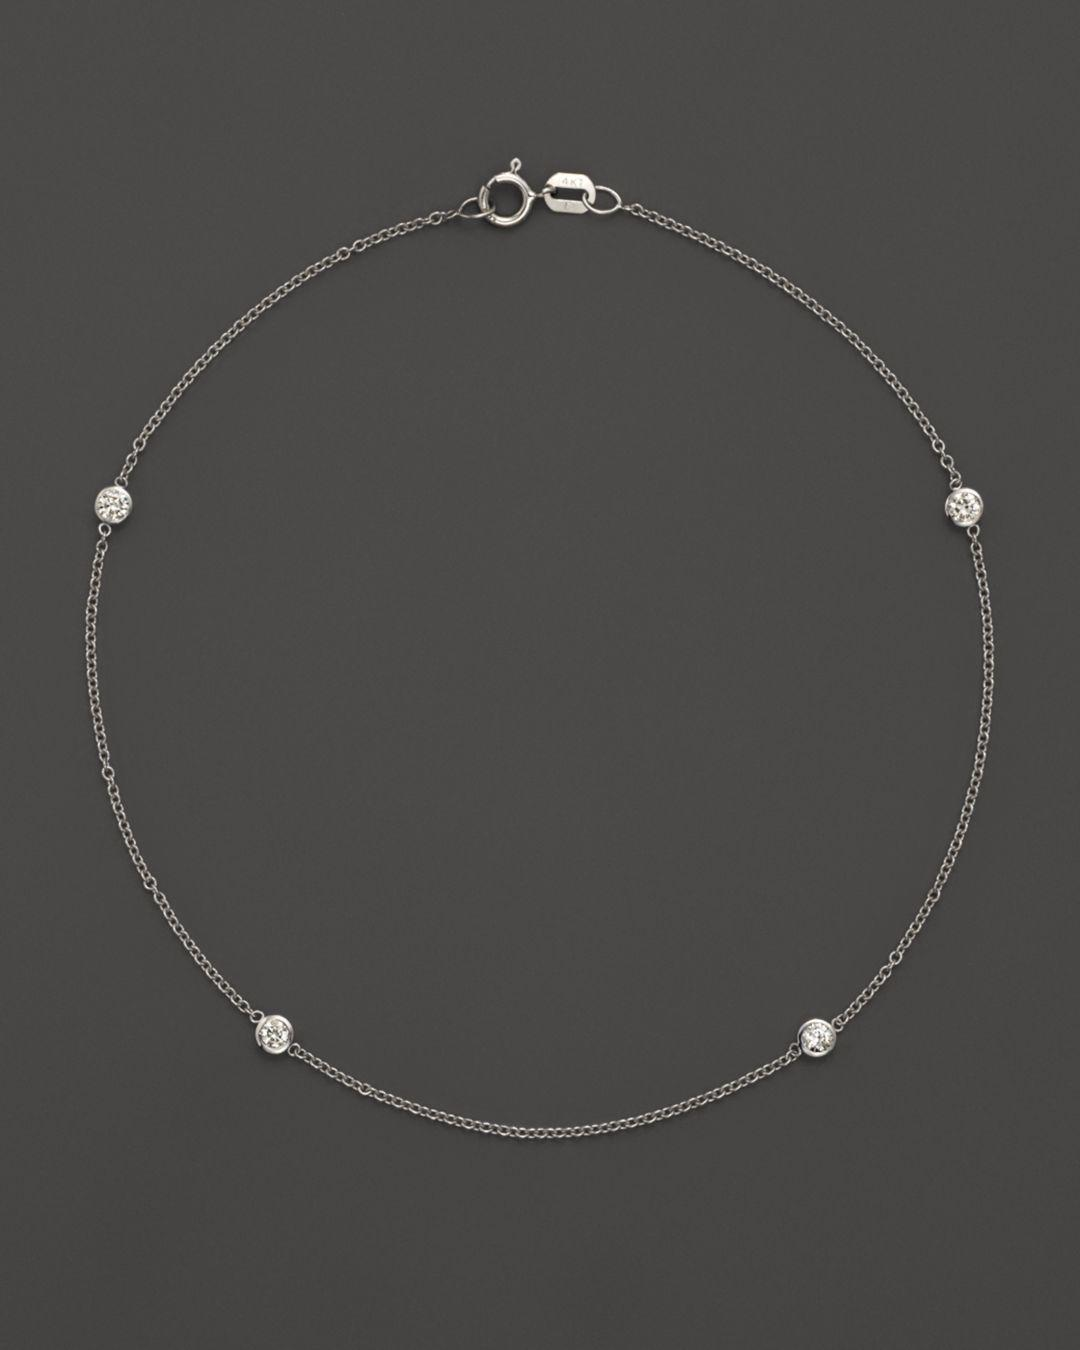 Bloomingdale S Women Diamond Bezel Ankle Bracelet Set In 14k White Gold